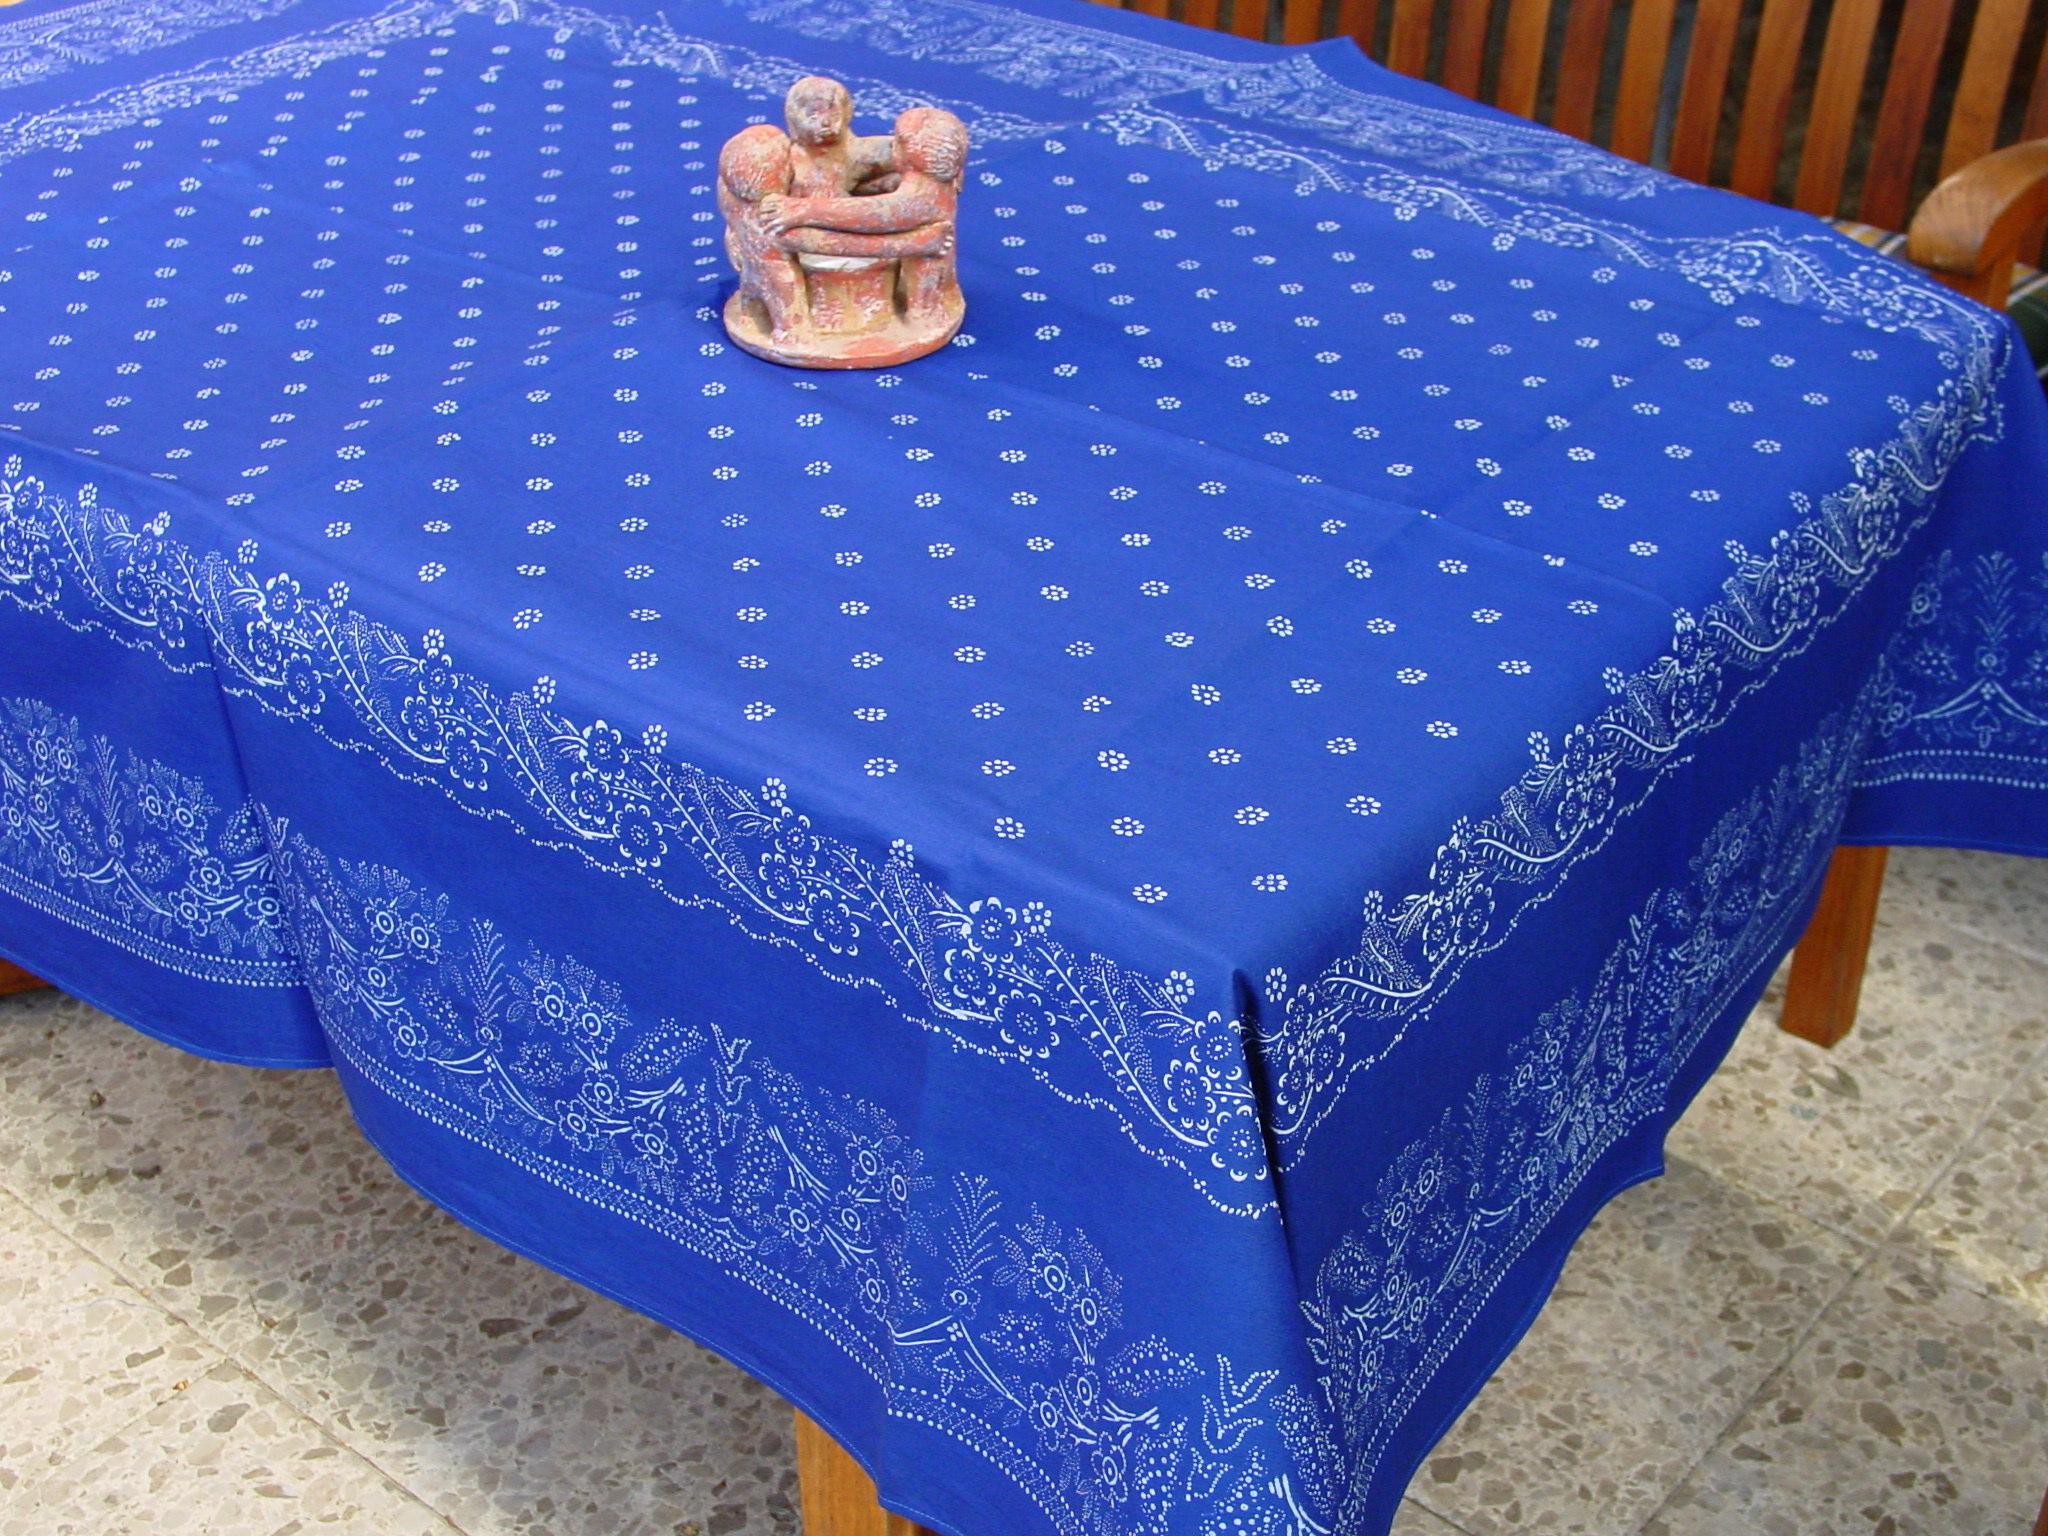 Große Blaudruck-Tischdecke 6493-1344